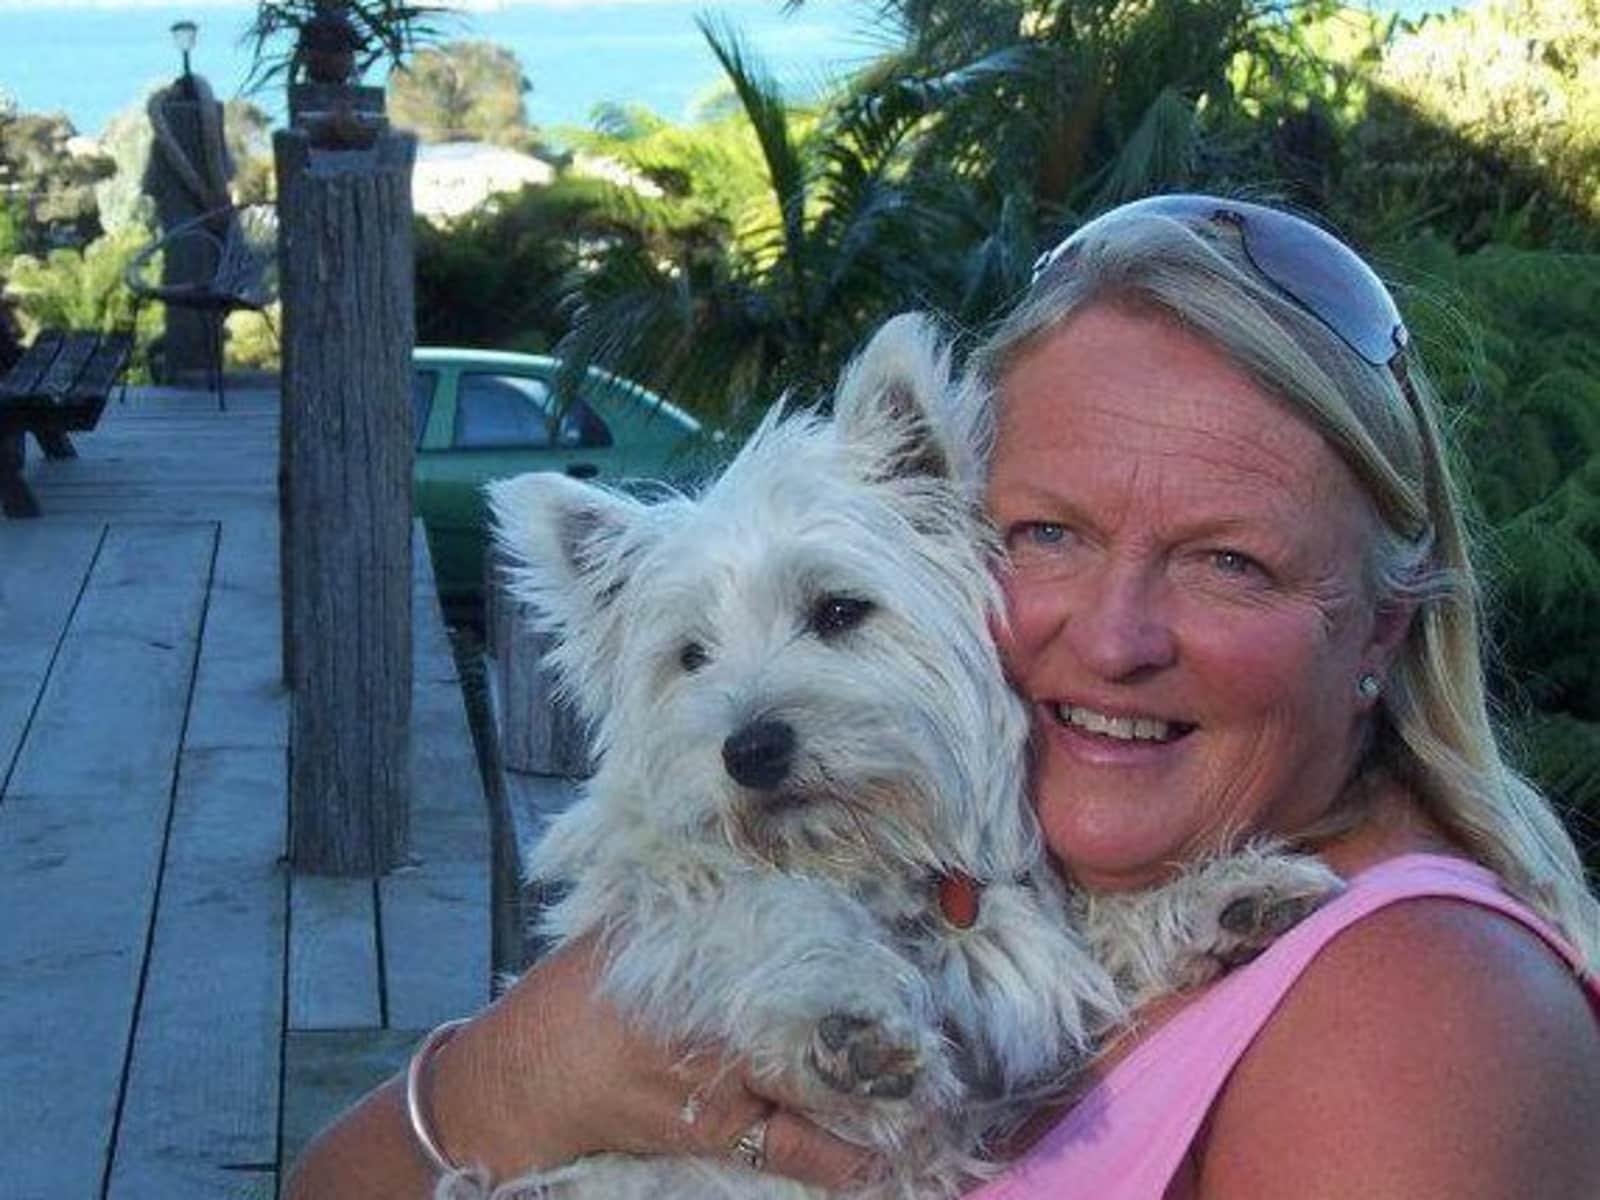 Suzy from Whitianga, New Zealand